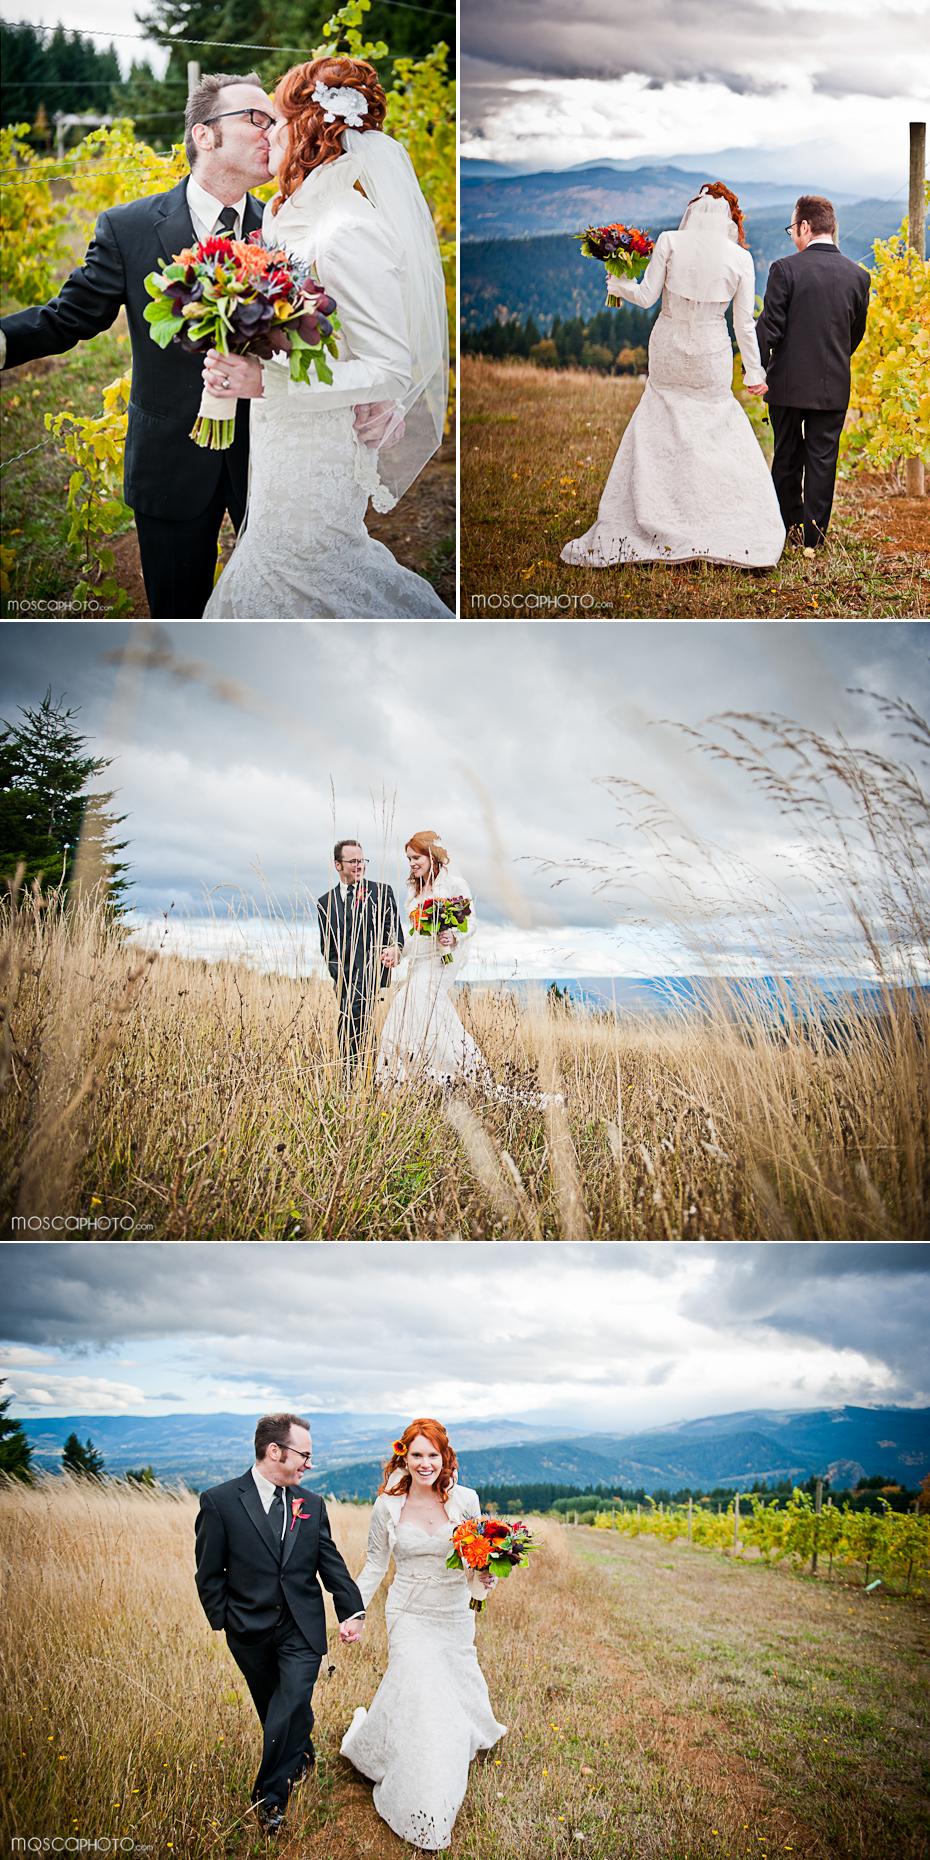 Wedding decoration fall outdoor wedding attire for What to wear to a fall outdoor wedding